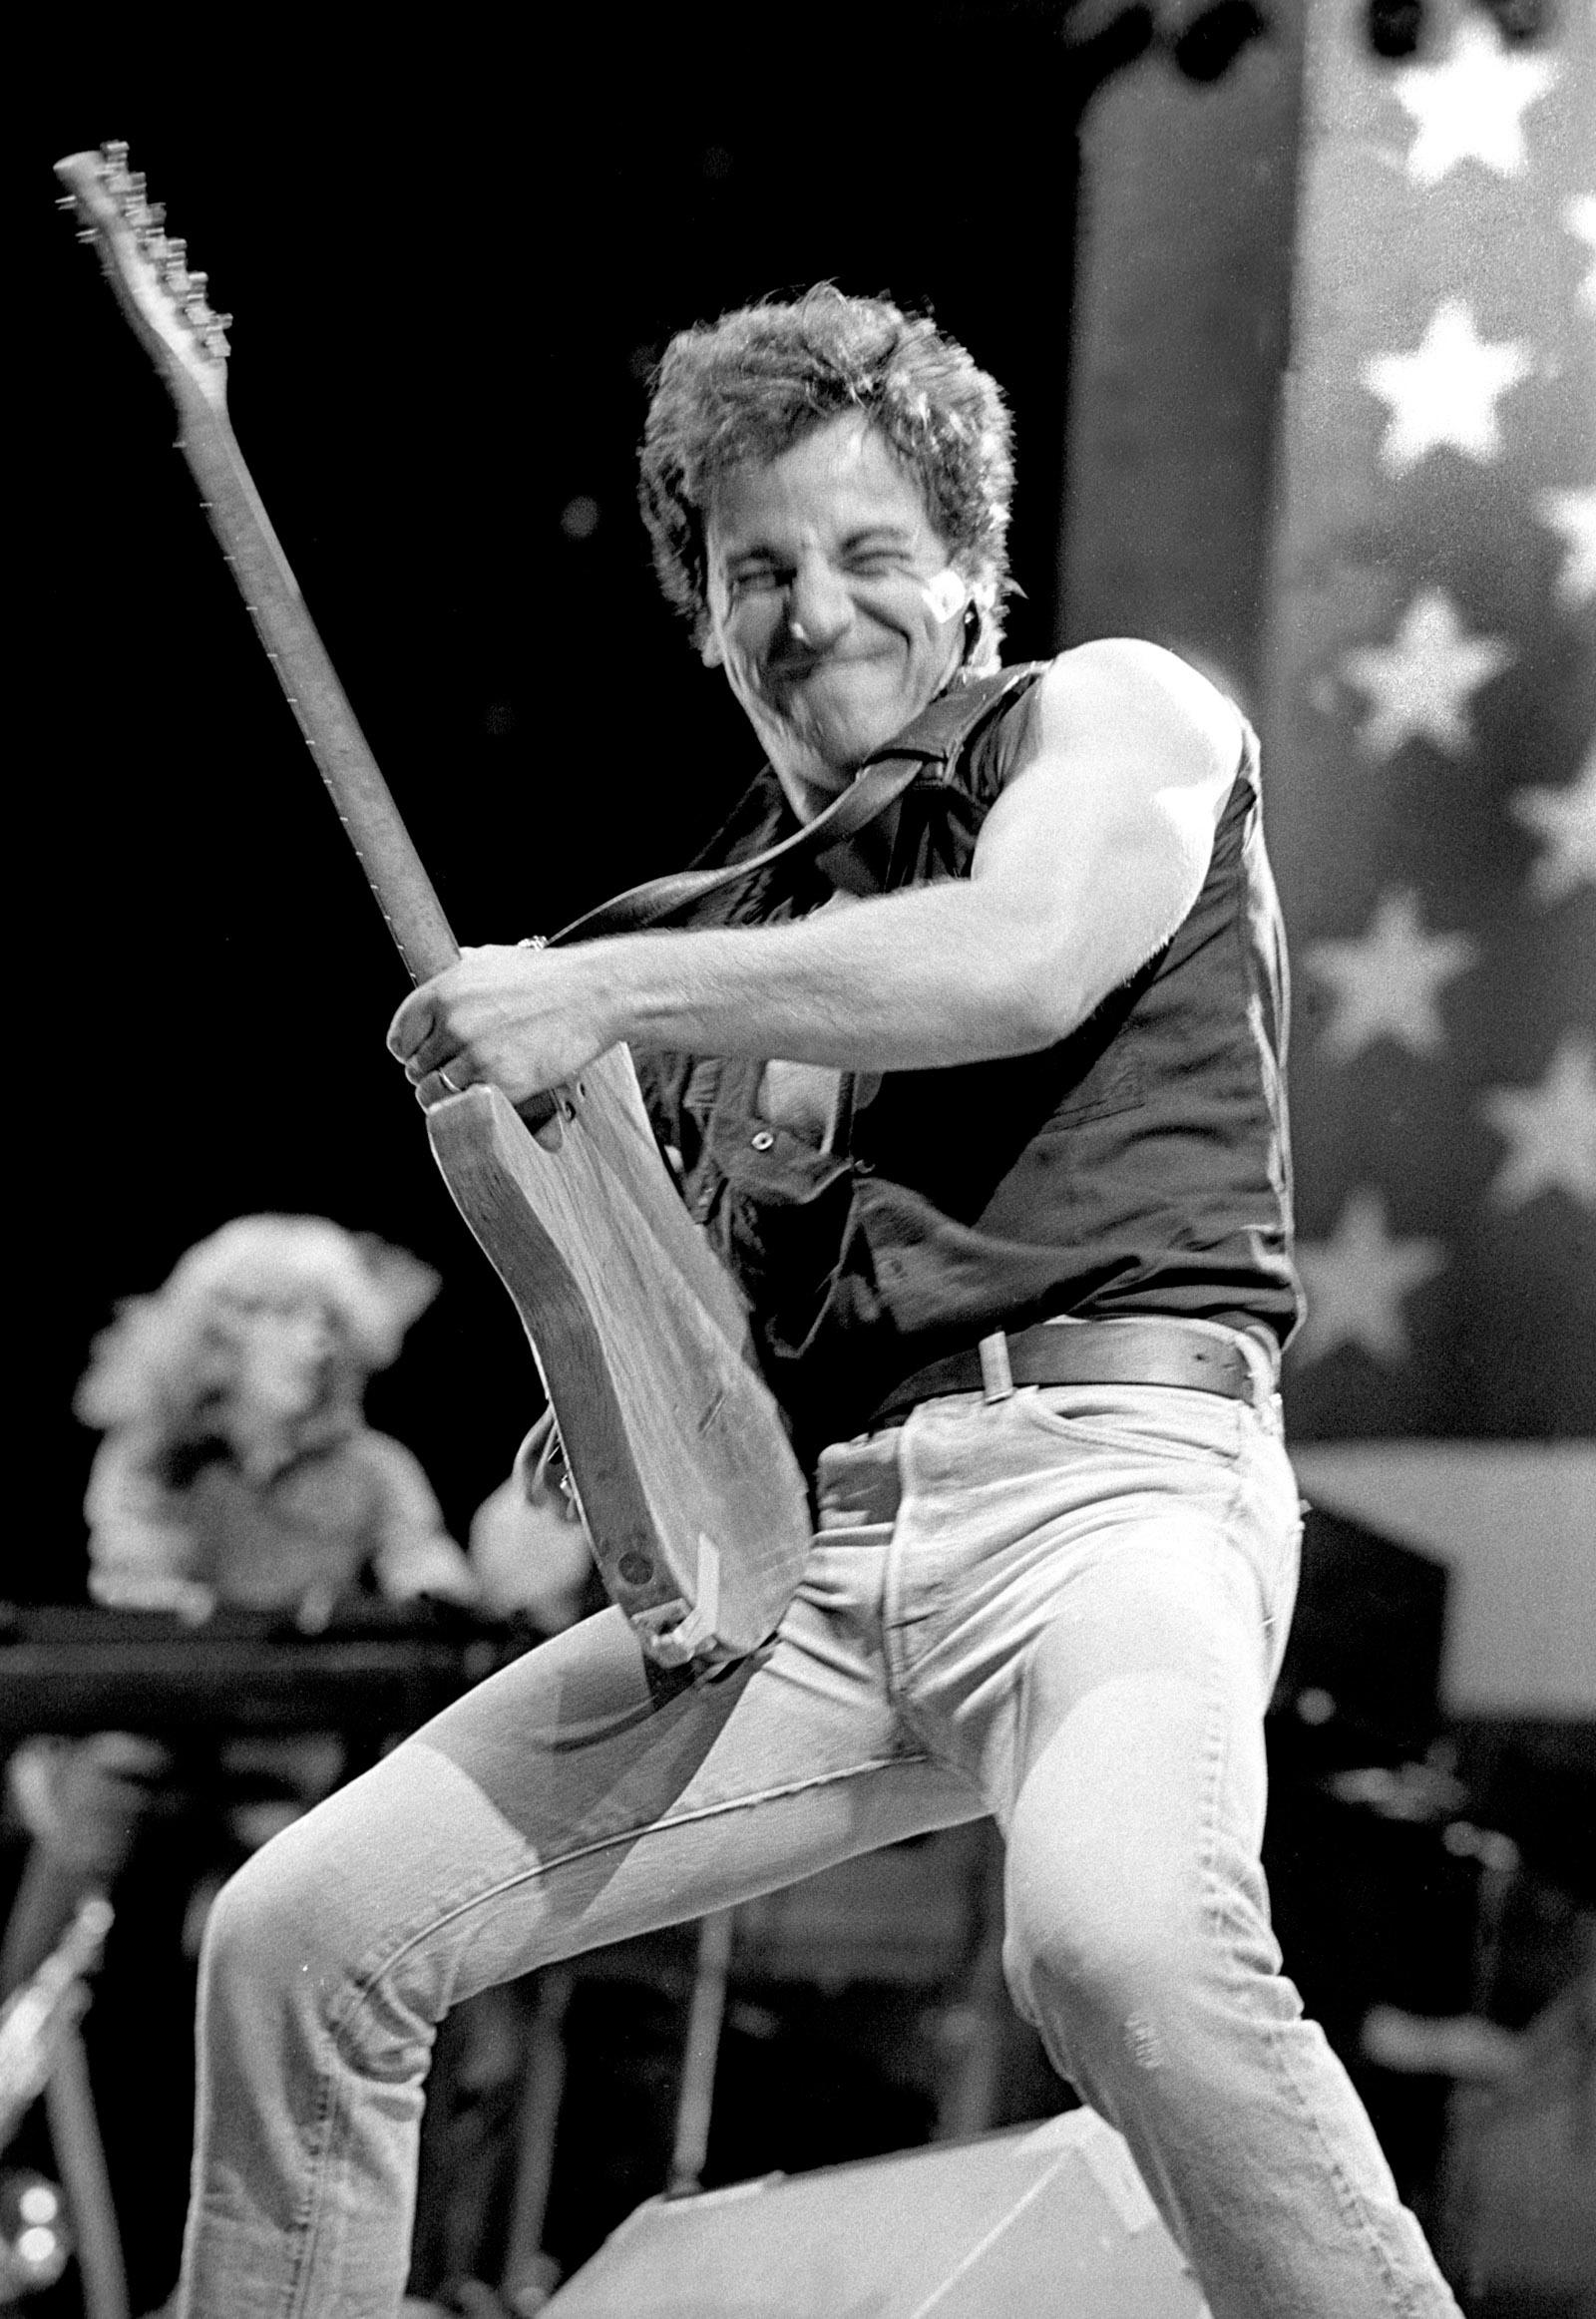 Bruce Springsteen performing at the Oakland Coliseum, California, September 1985